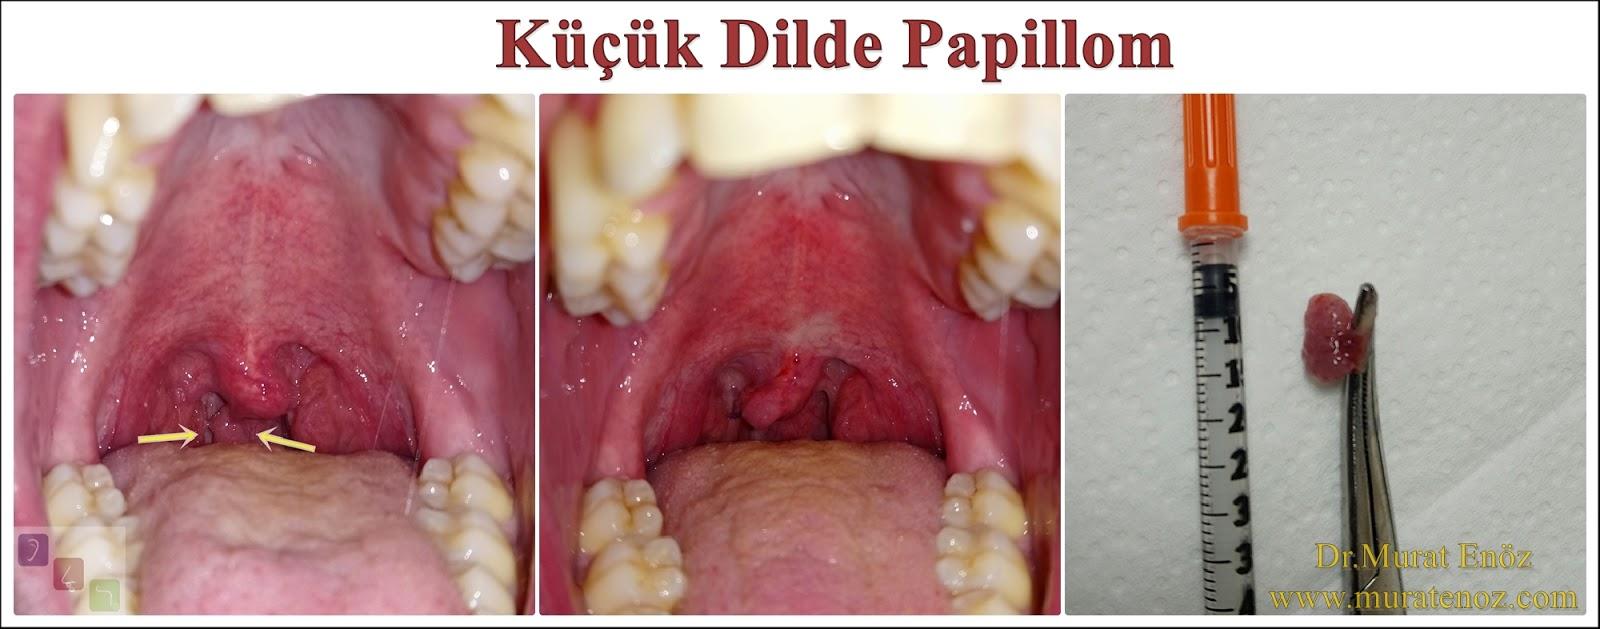 papilloma in uvula